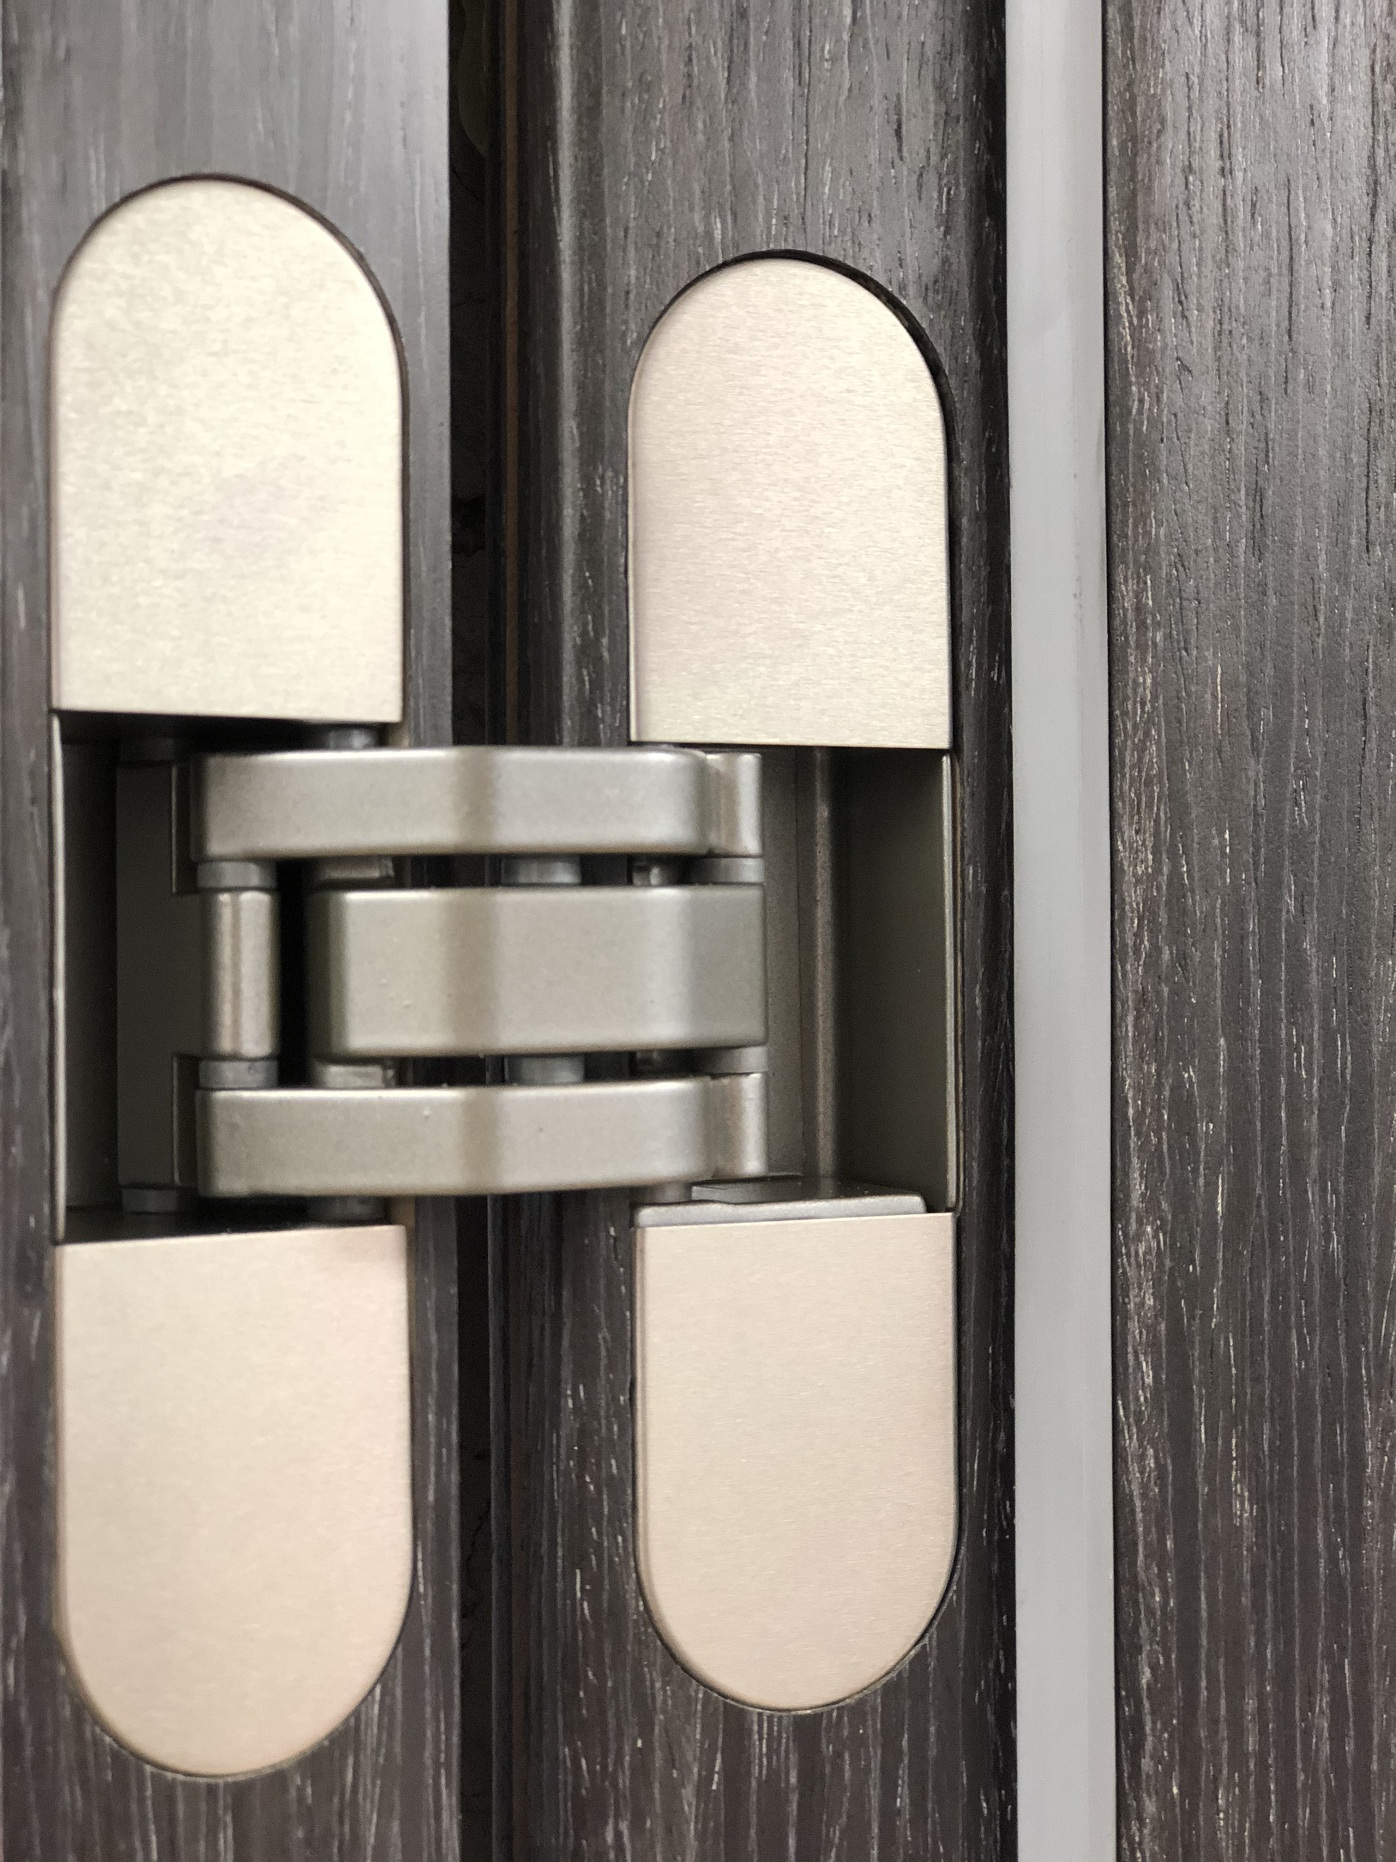 Image Versa Vetro Interior Door Black Apricot 3